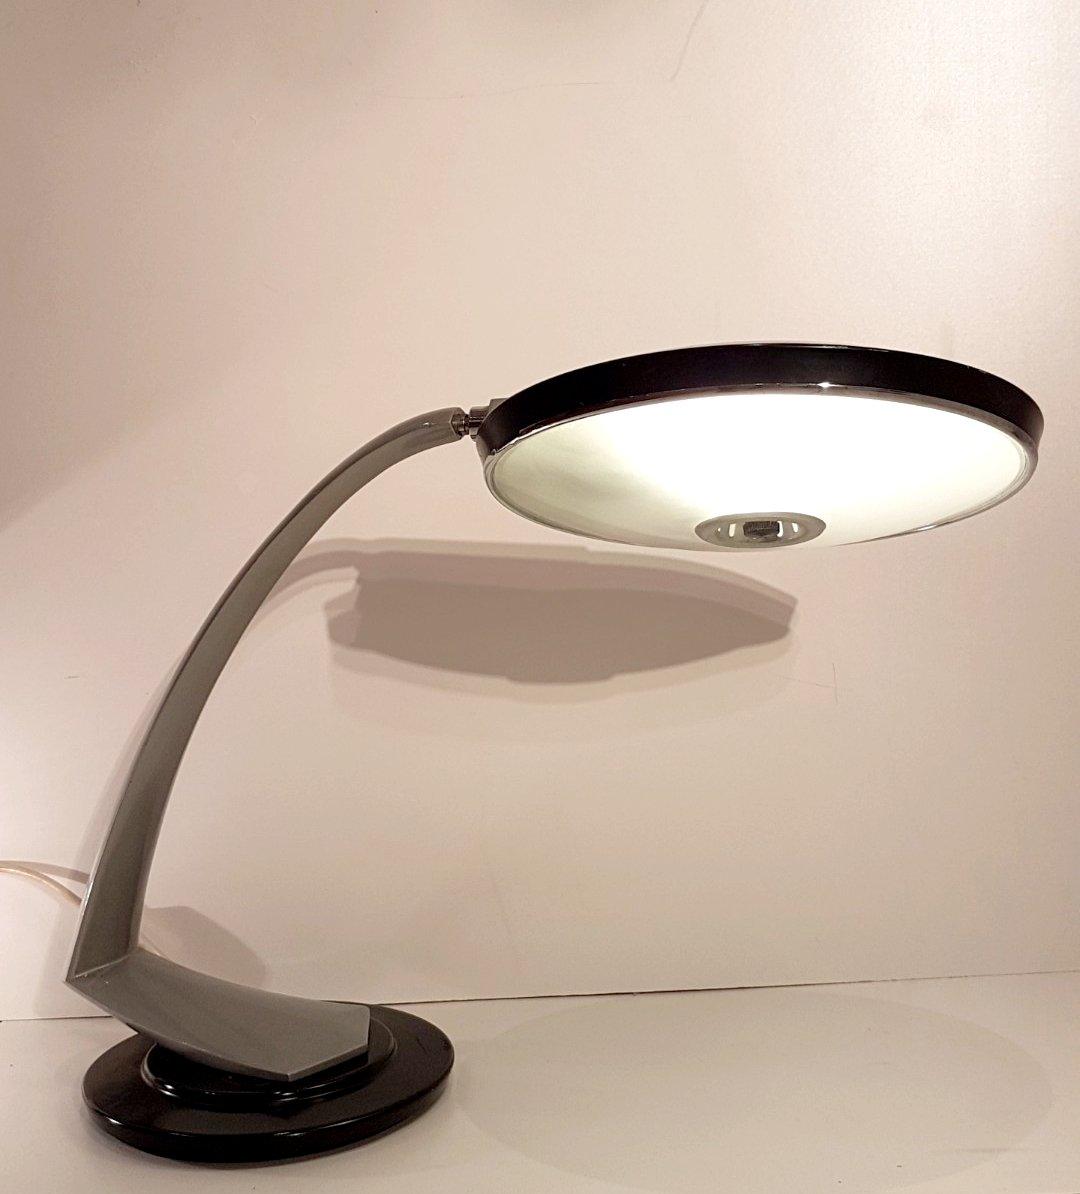 lampe de bureau boomerang de fase 1970s en vente sur pamono. Black Bedroom Furniture Sets. Home Design Ideas